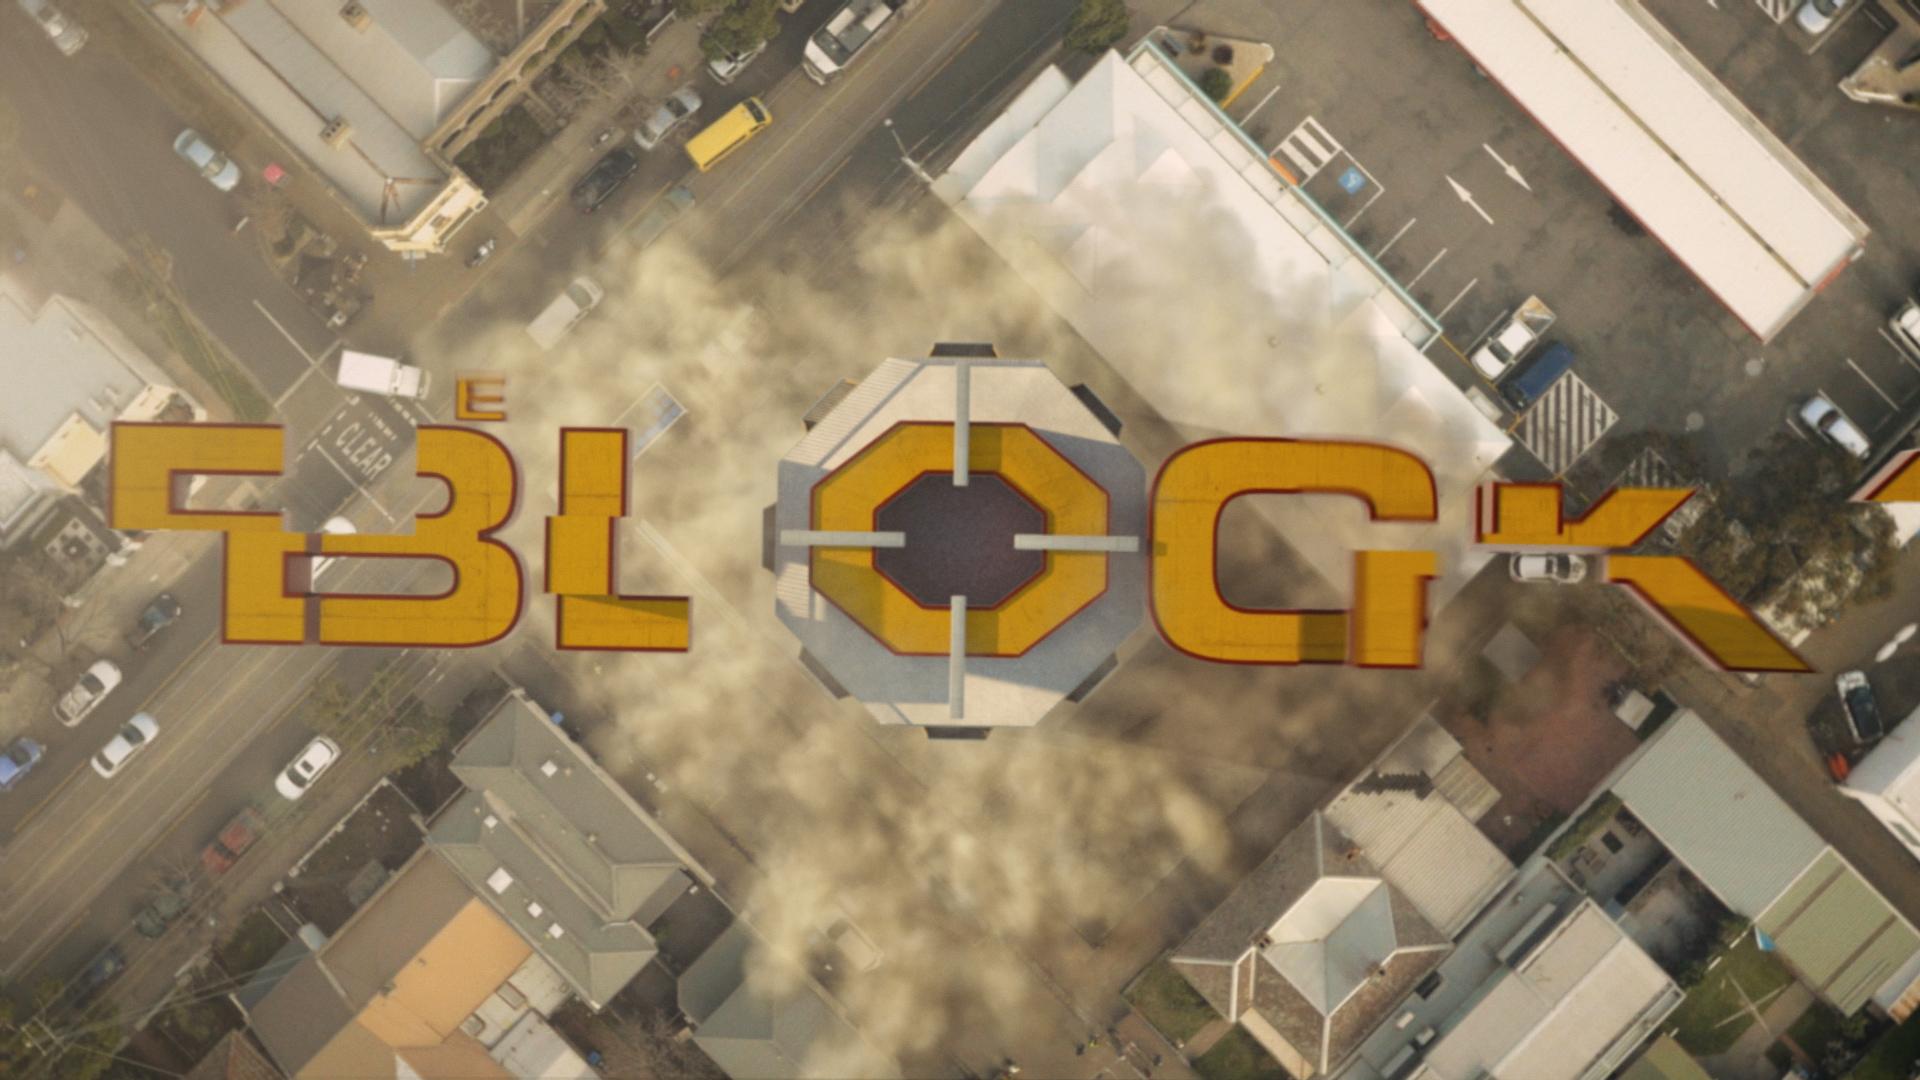 THE_BLOCK_OPENER_DIRECTORS_CUT.seq.00_00_23_05.Still018.jpg